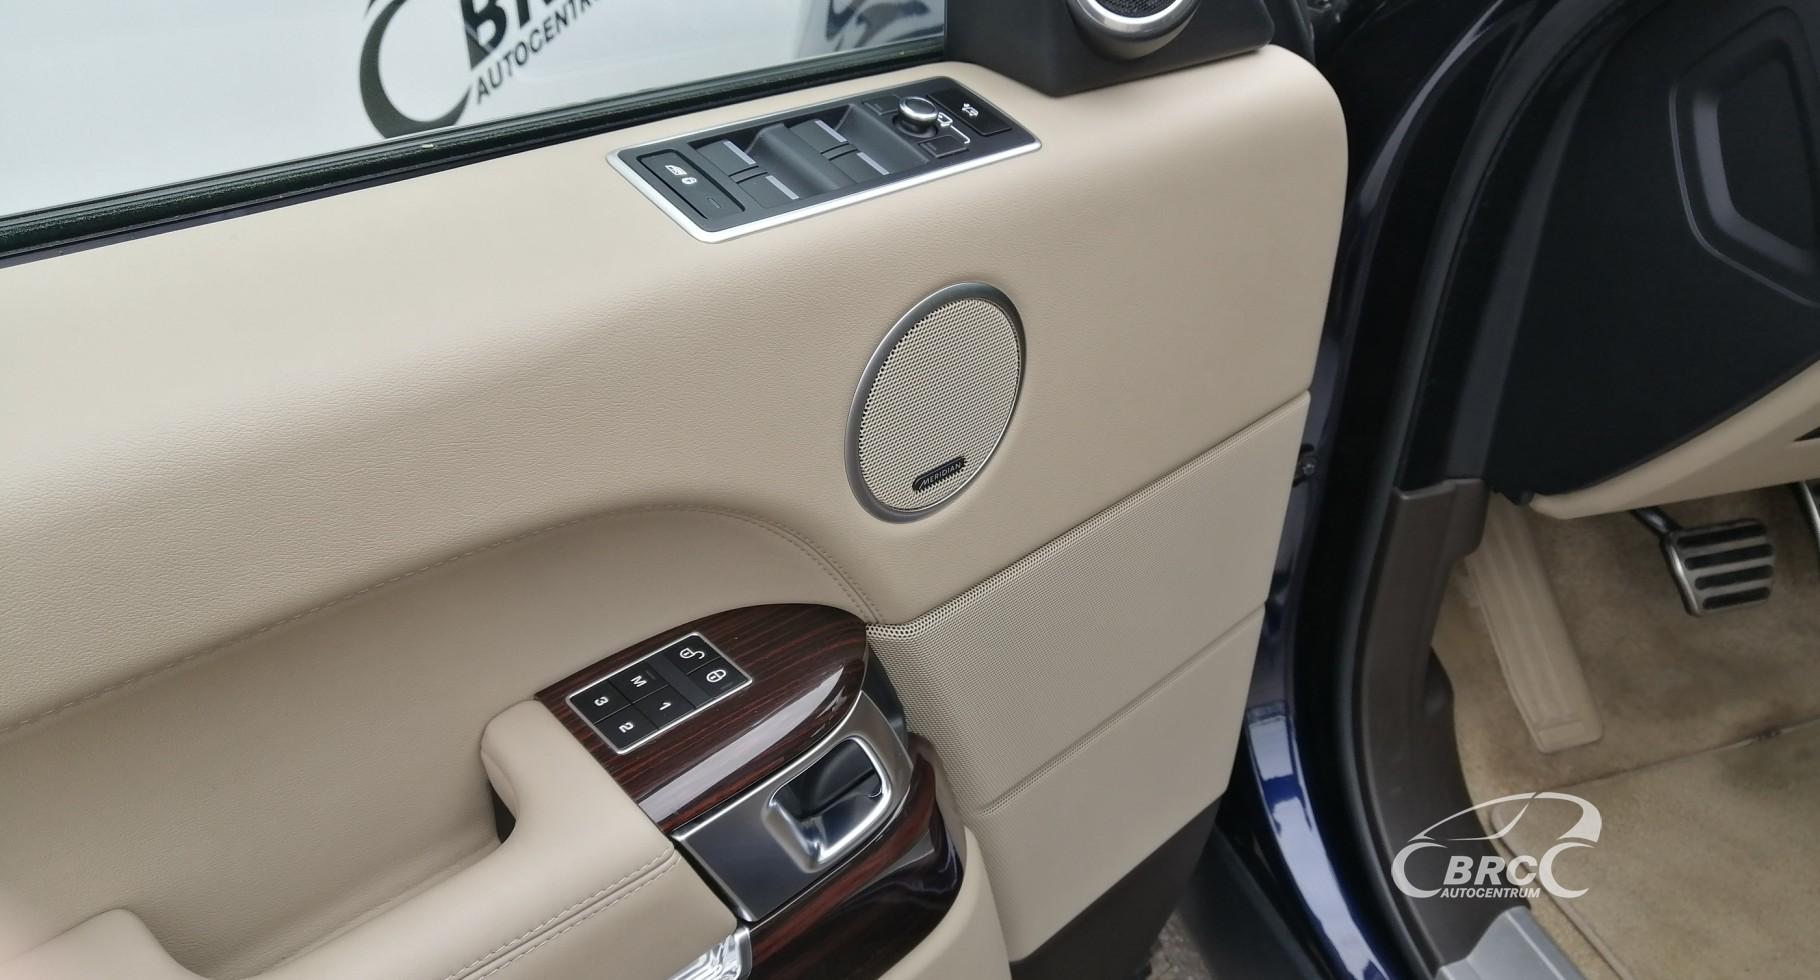 Land-Rover Range Rover 5.0i V8 SUPERCHARGED Automatas